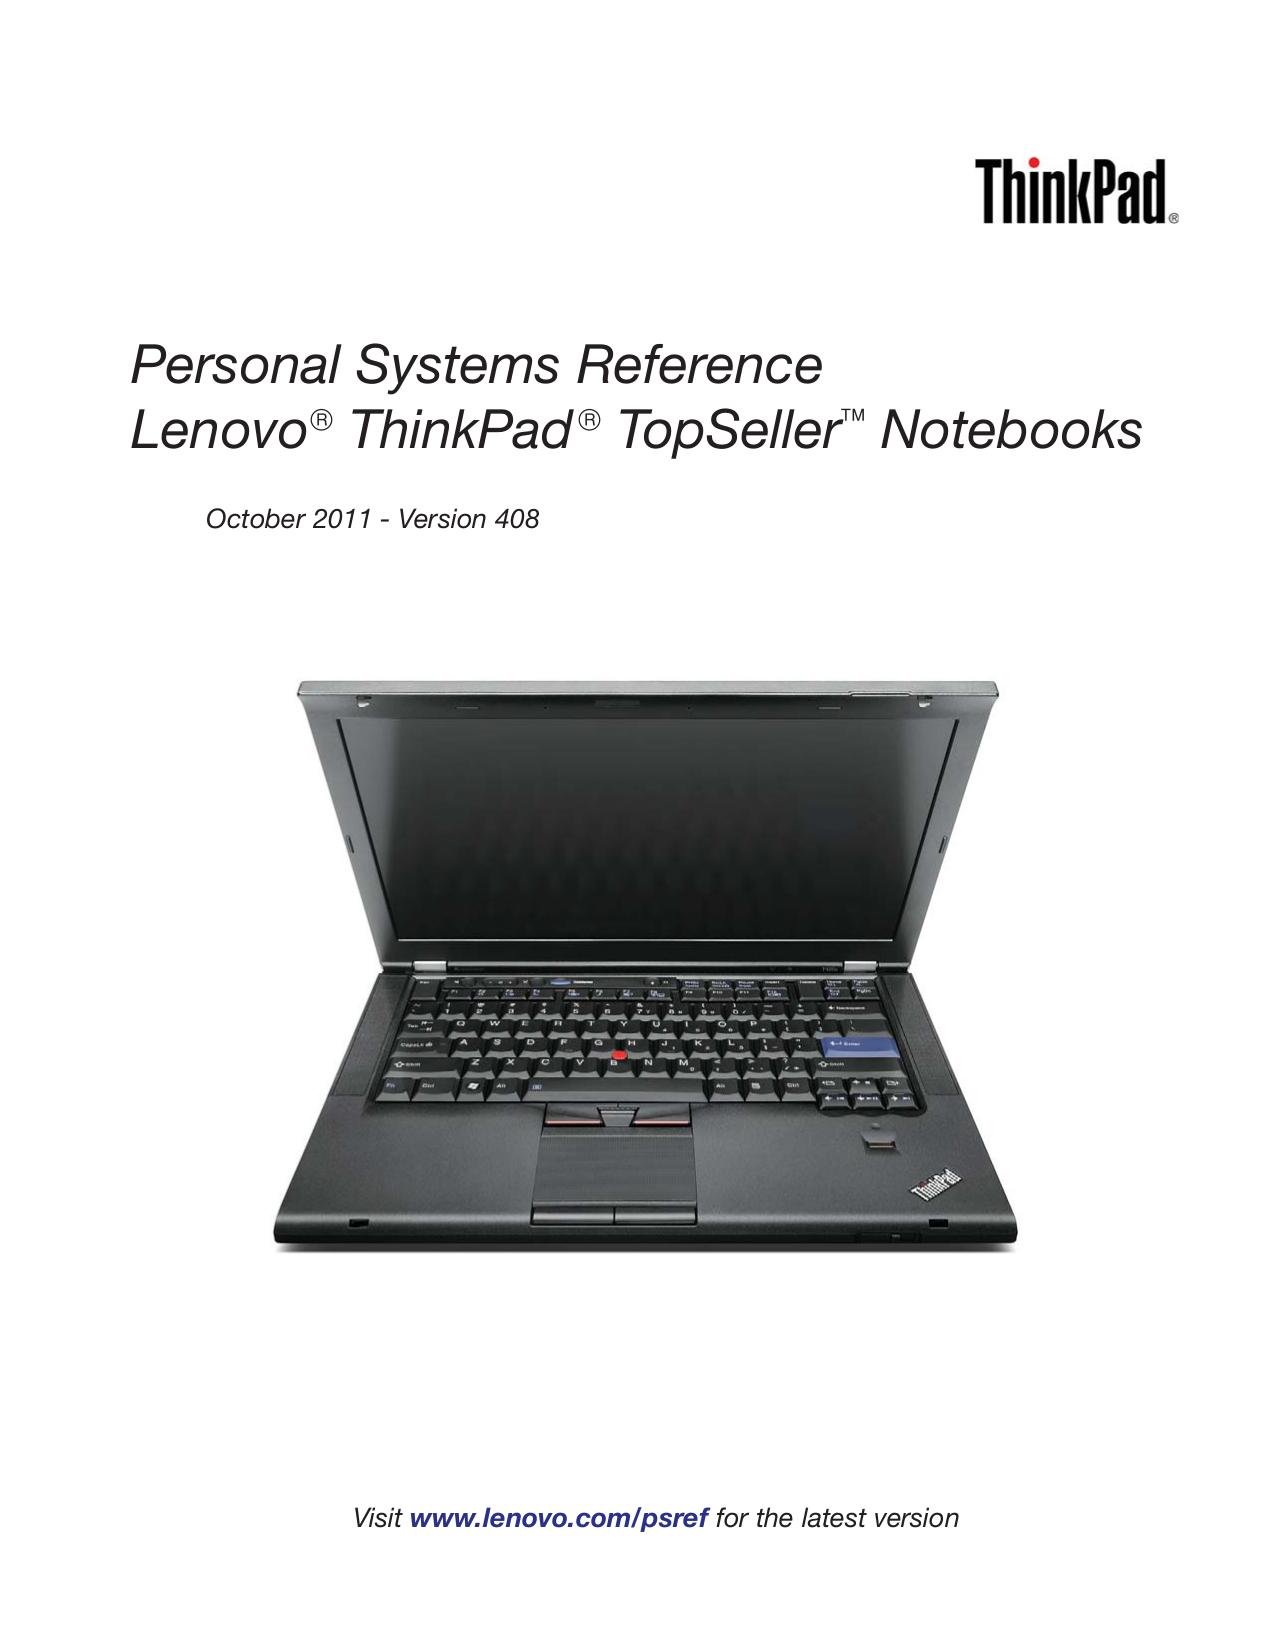 pdf for Lenovo Desktop ThinkCentre M70e 0829 manual